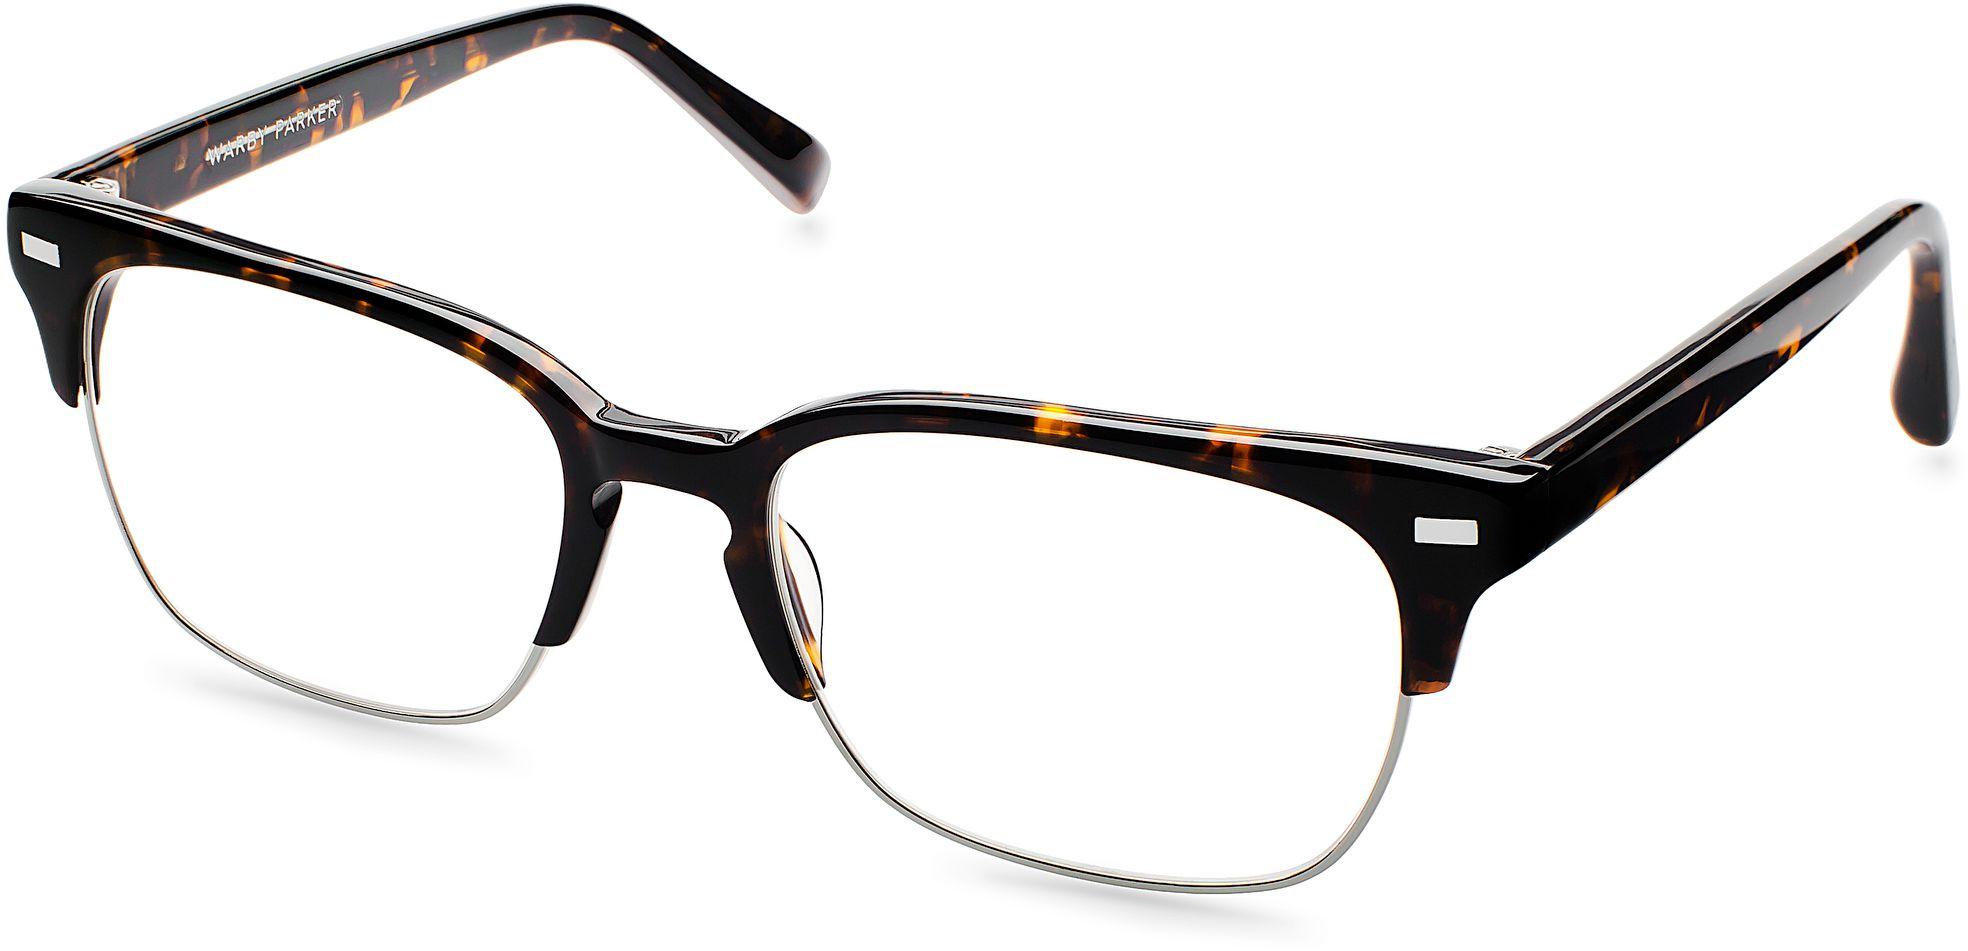 Ames Eyeglasses in Whiskey Tortoise for Men | Warby Parker